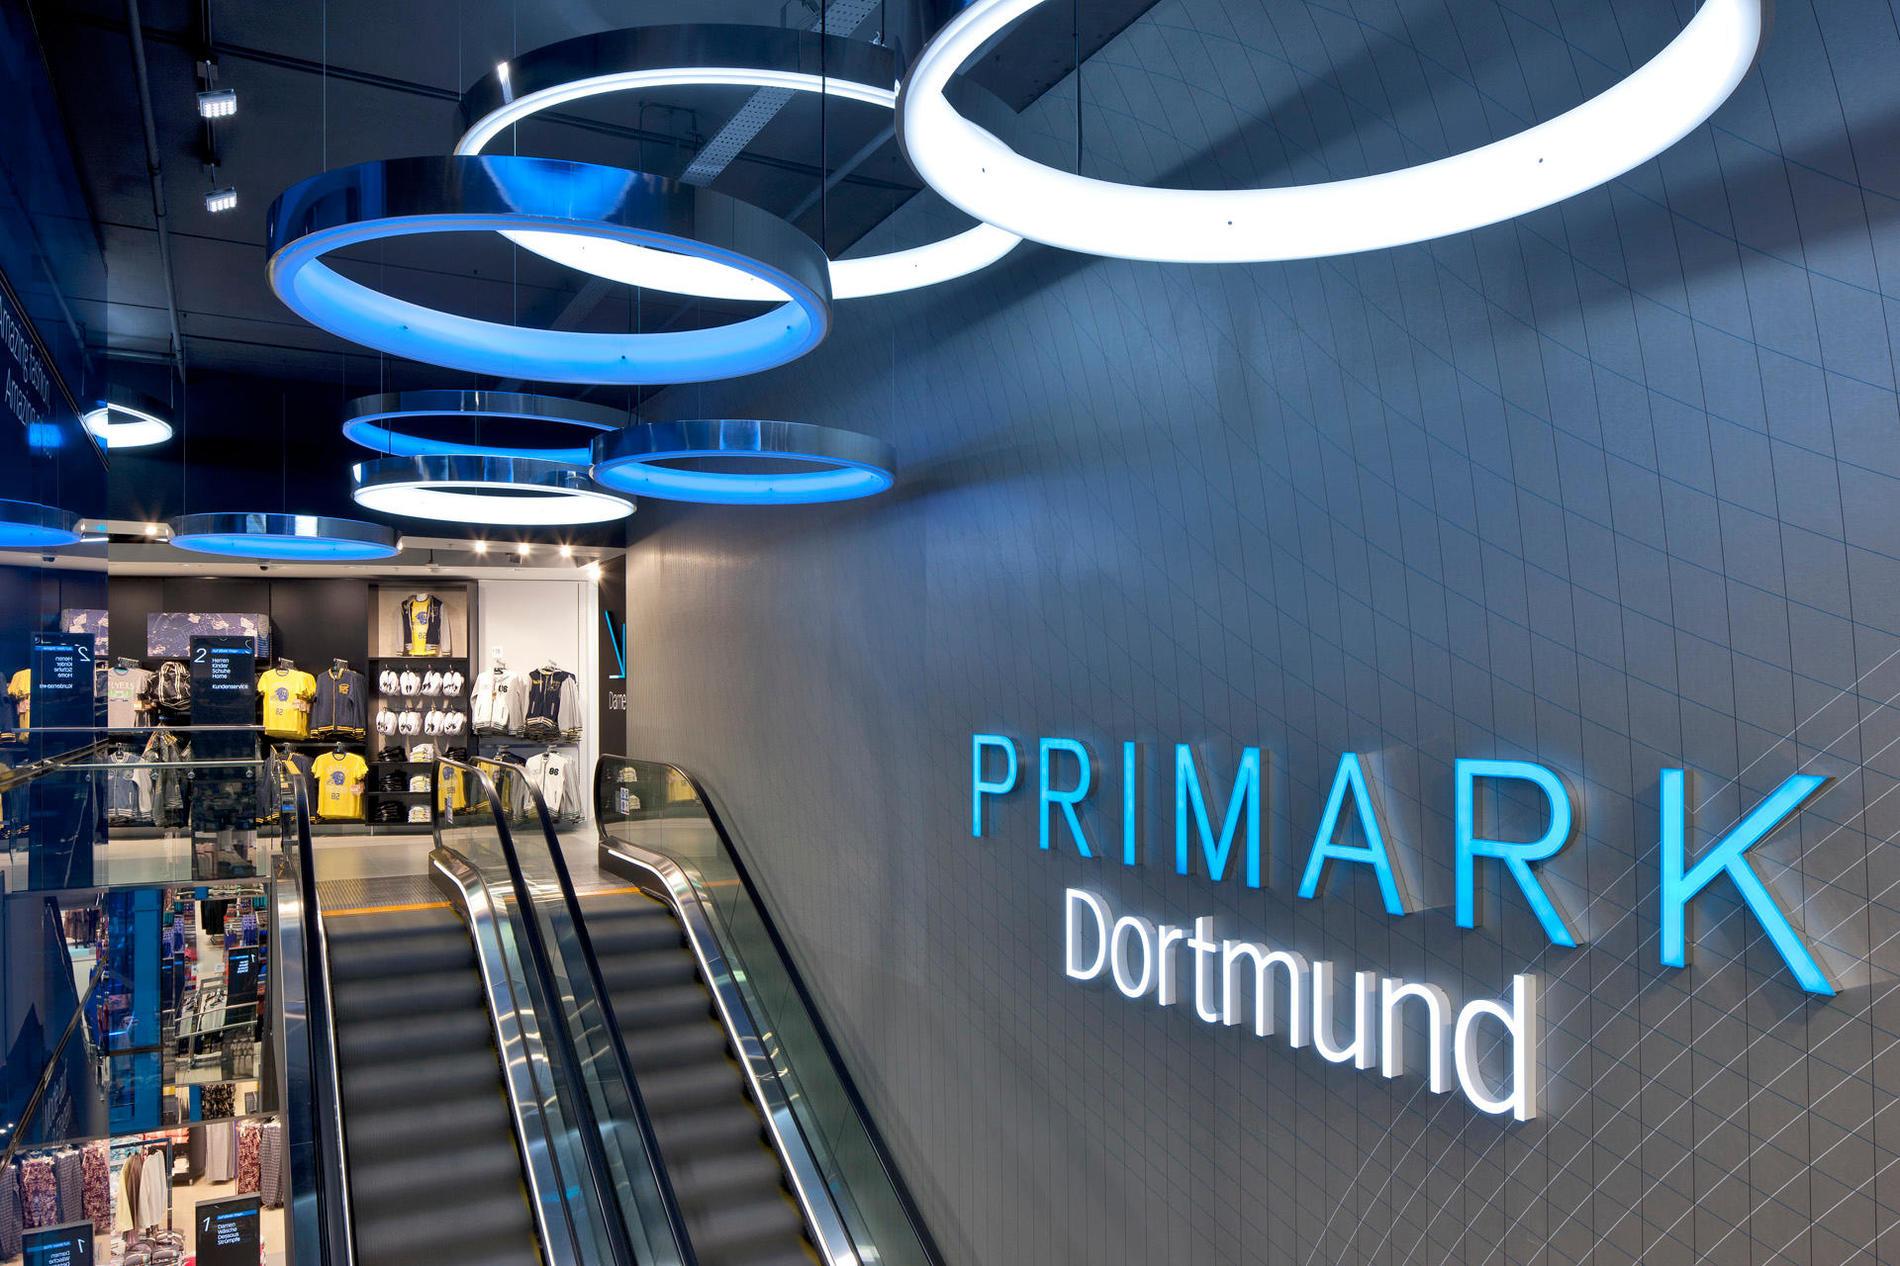 Primark Dortmund Dortmund Take Care Stay Safe